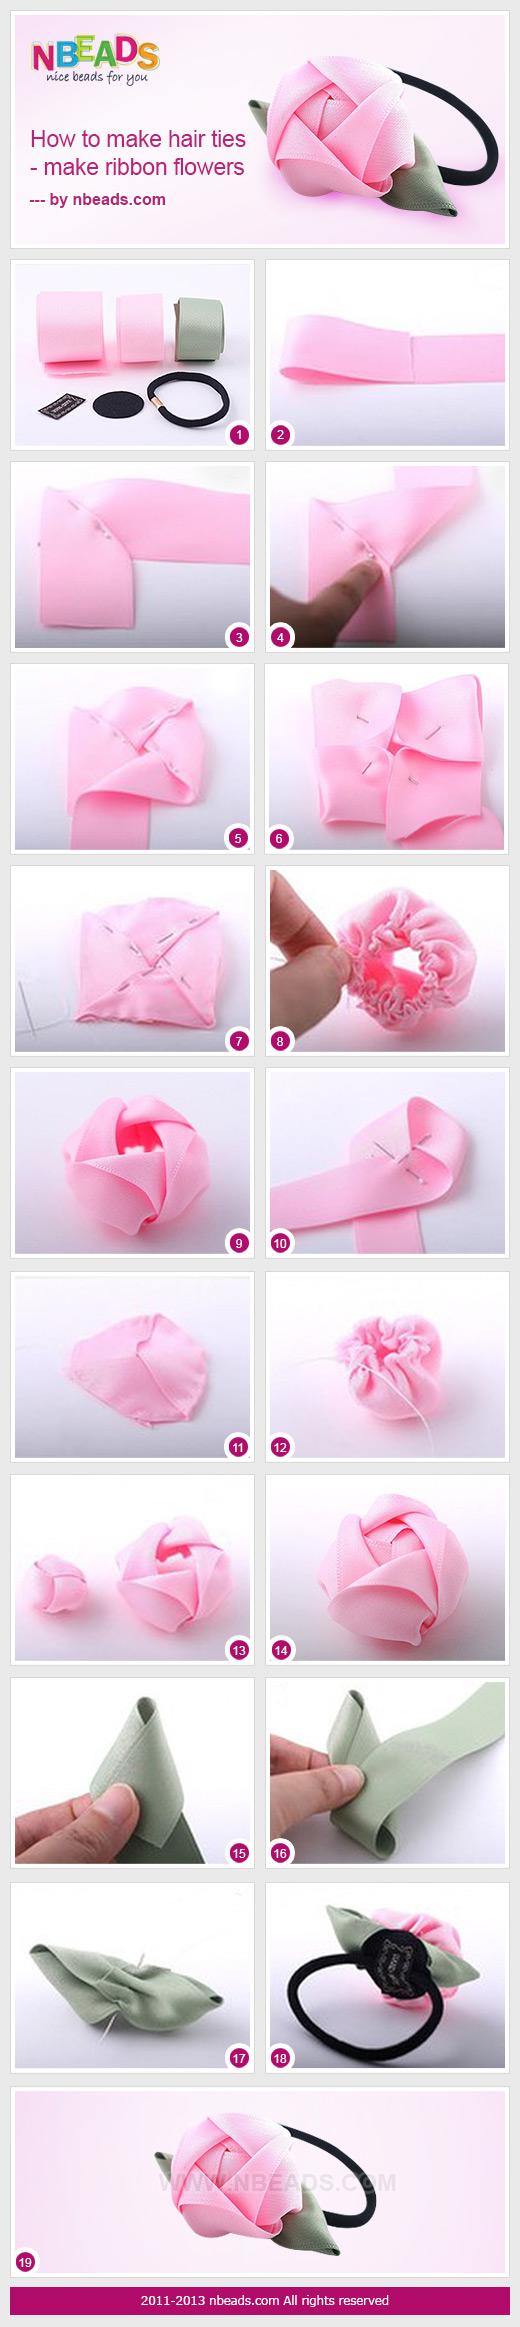 How to Make Hair Ties - Make Ribbon Flowers